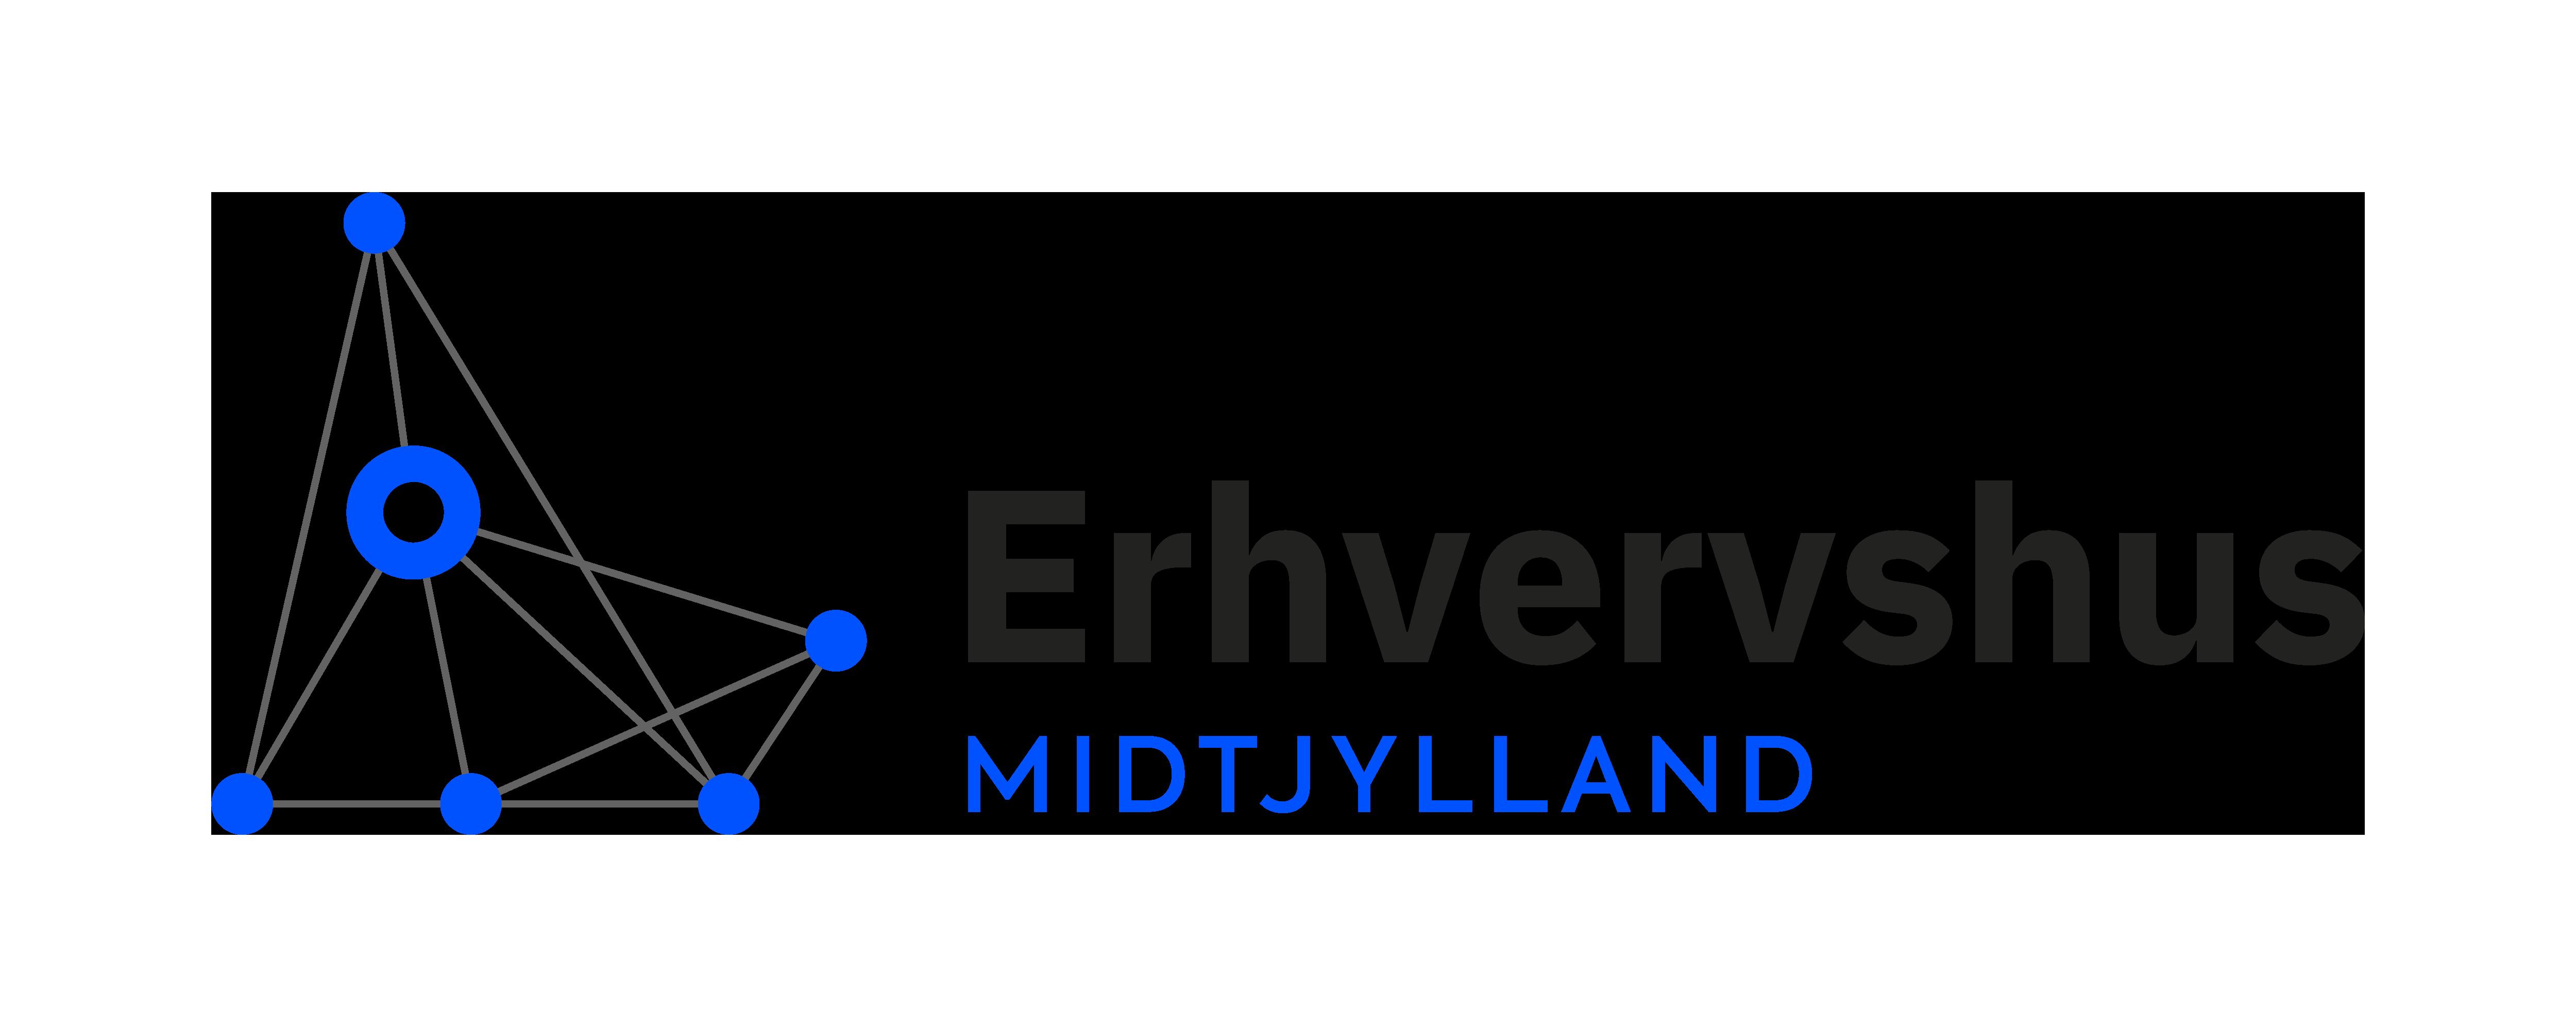 Erhvershus Midtjylland Logo